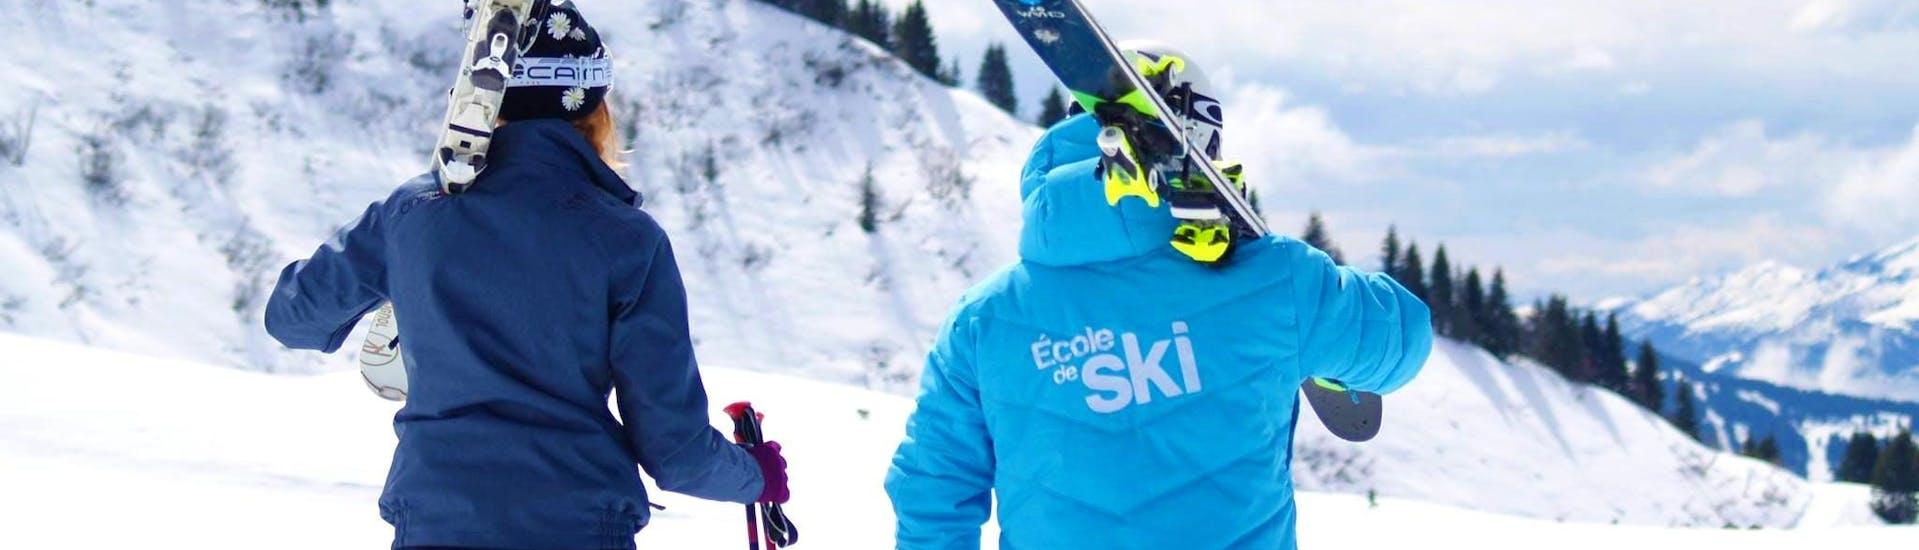 adult-ski-lessons-holidays-easy2ride-avoriaz-hero